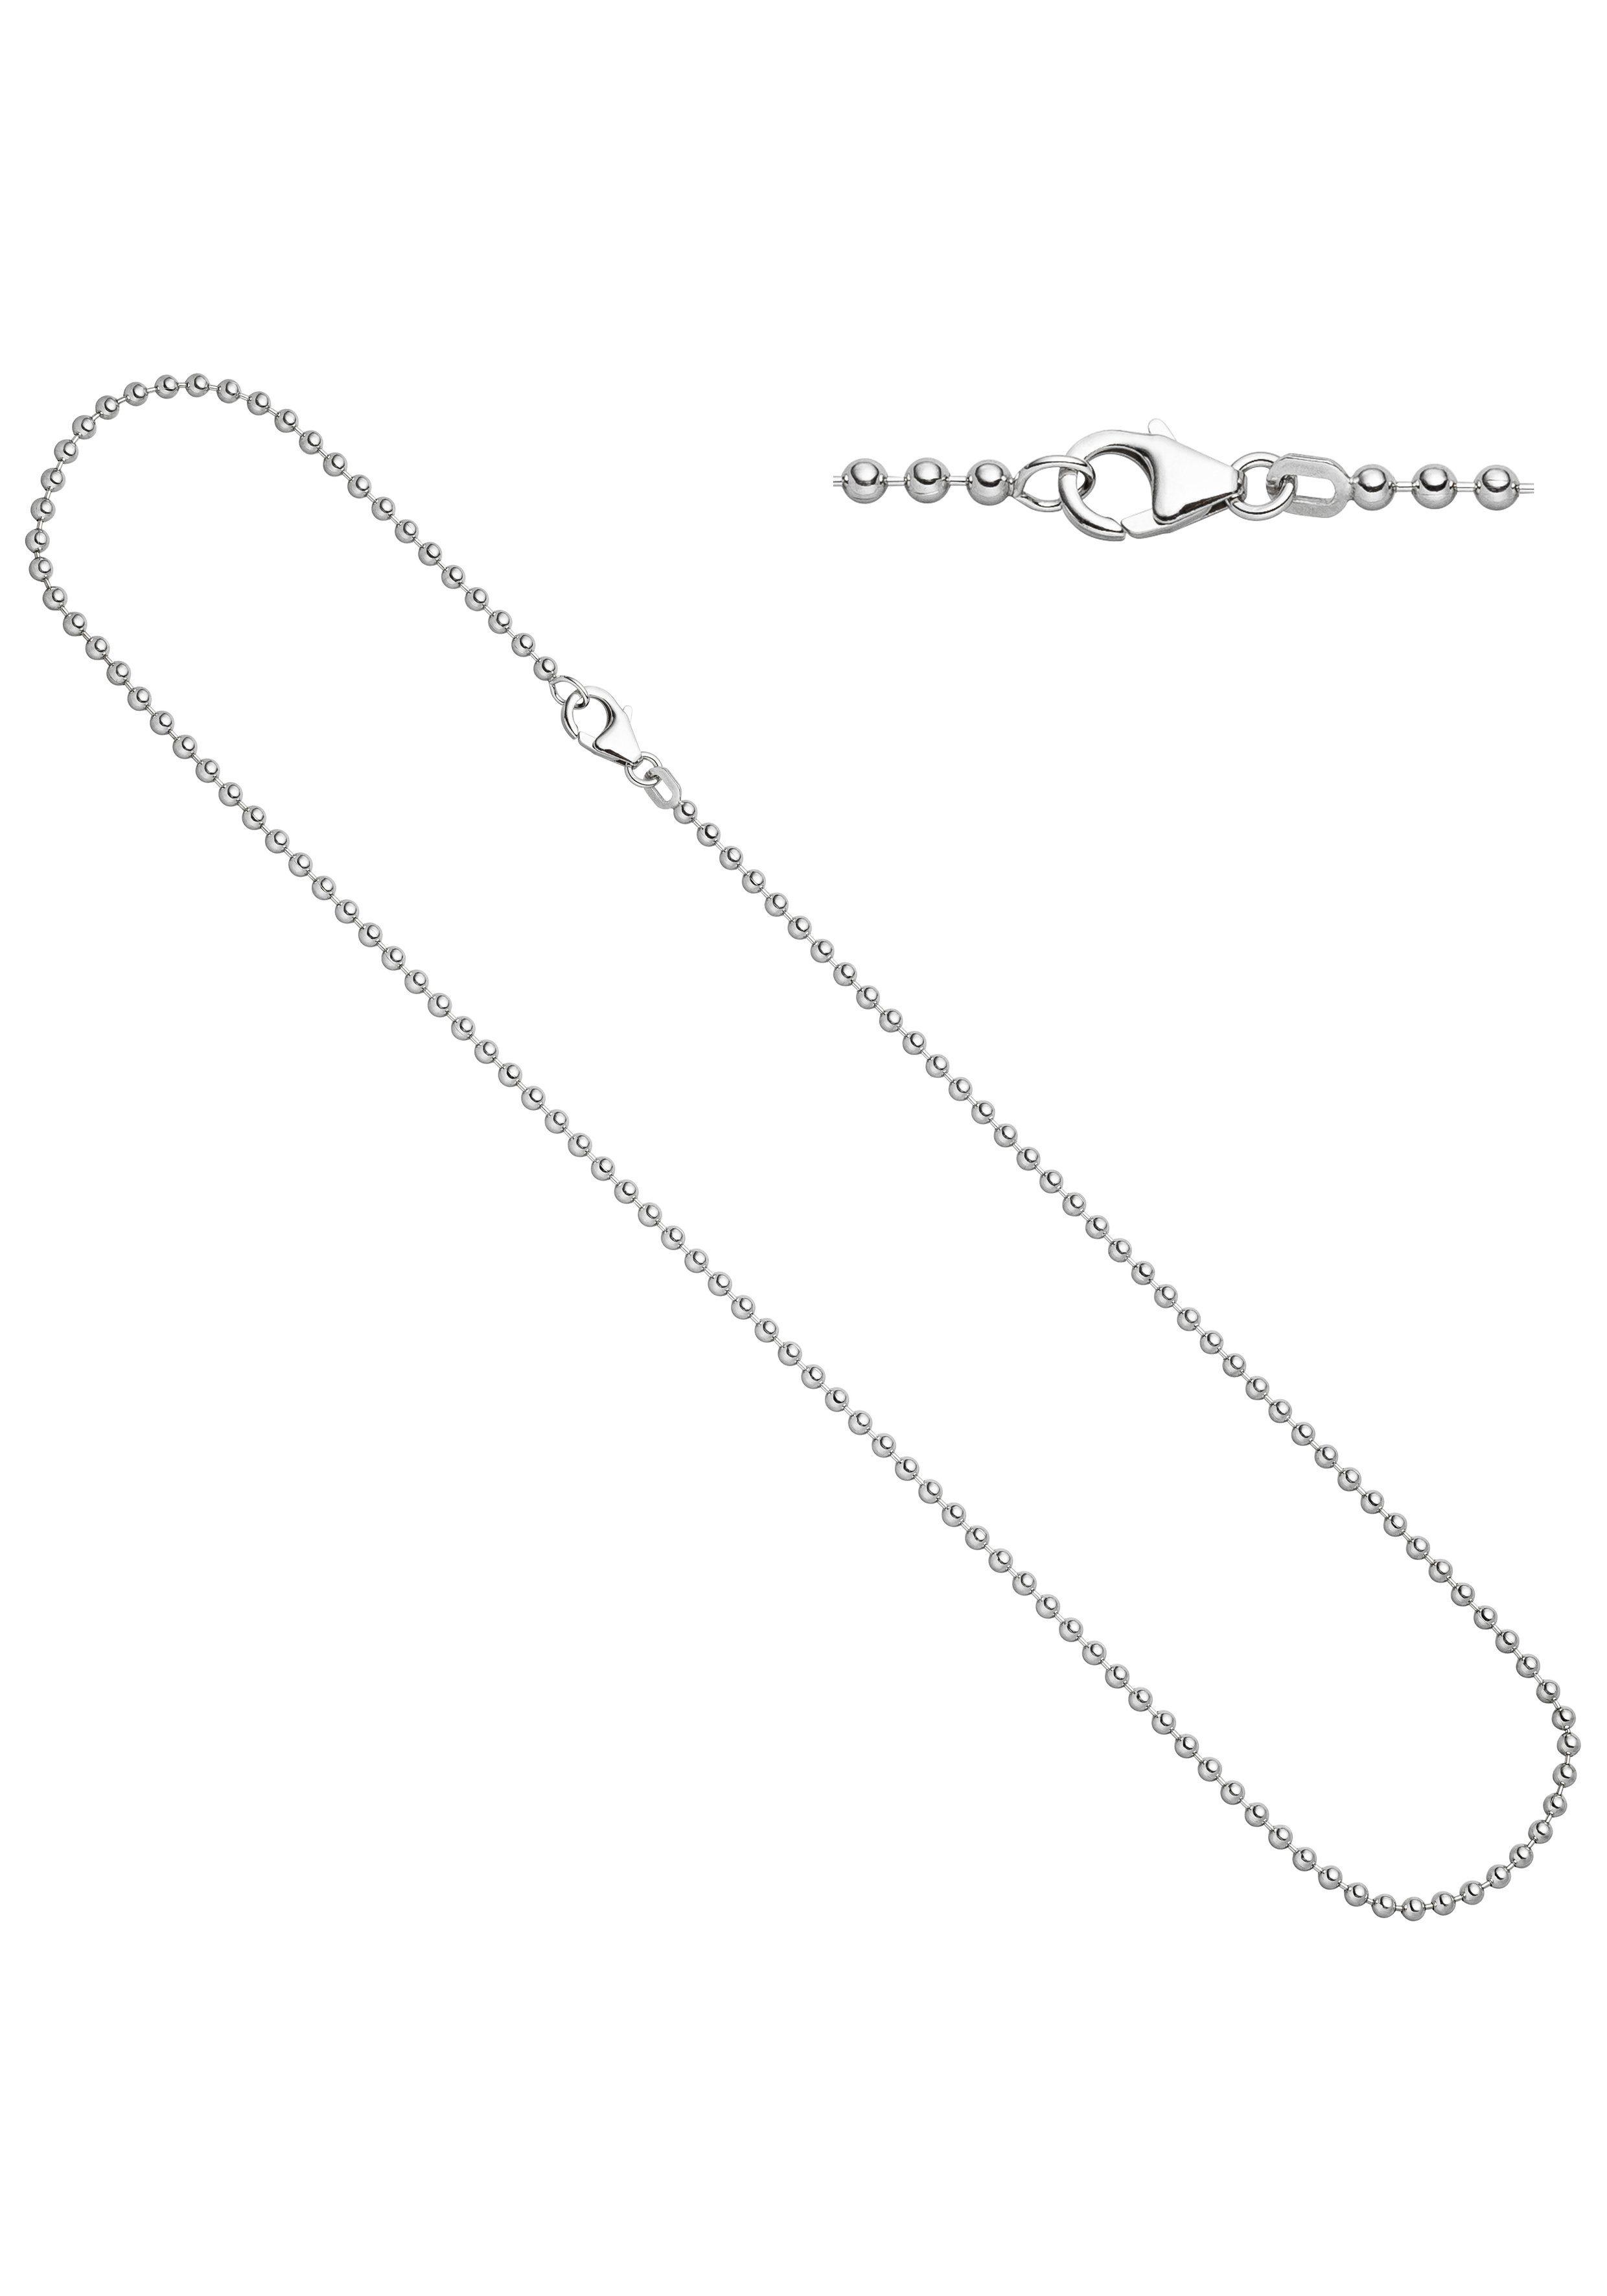 Edelstahl  Anhänger Flügel Silber Venezianerkette Halskette 2,0mm  60cm